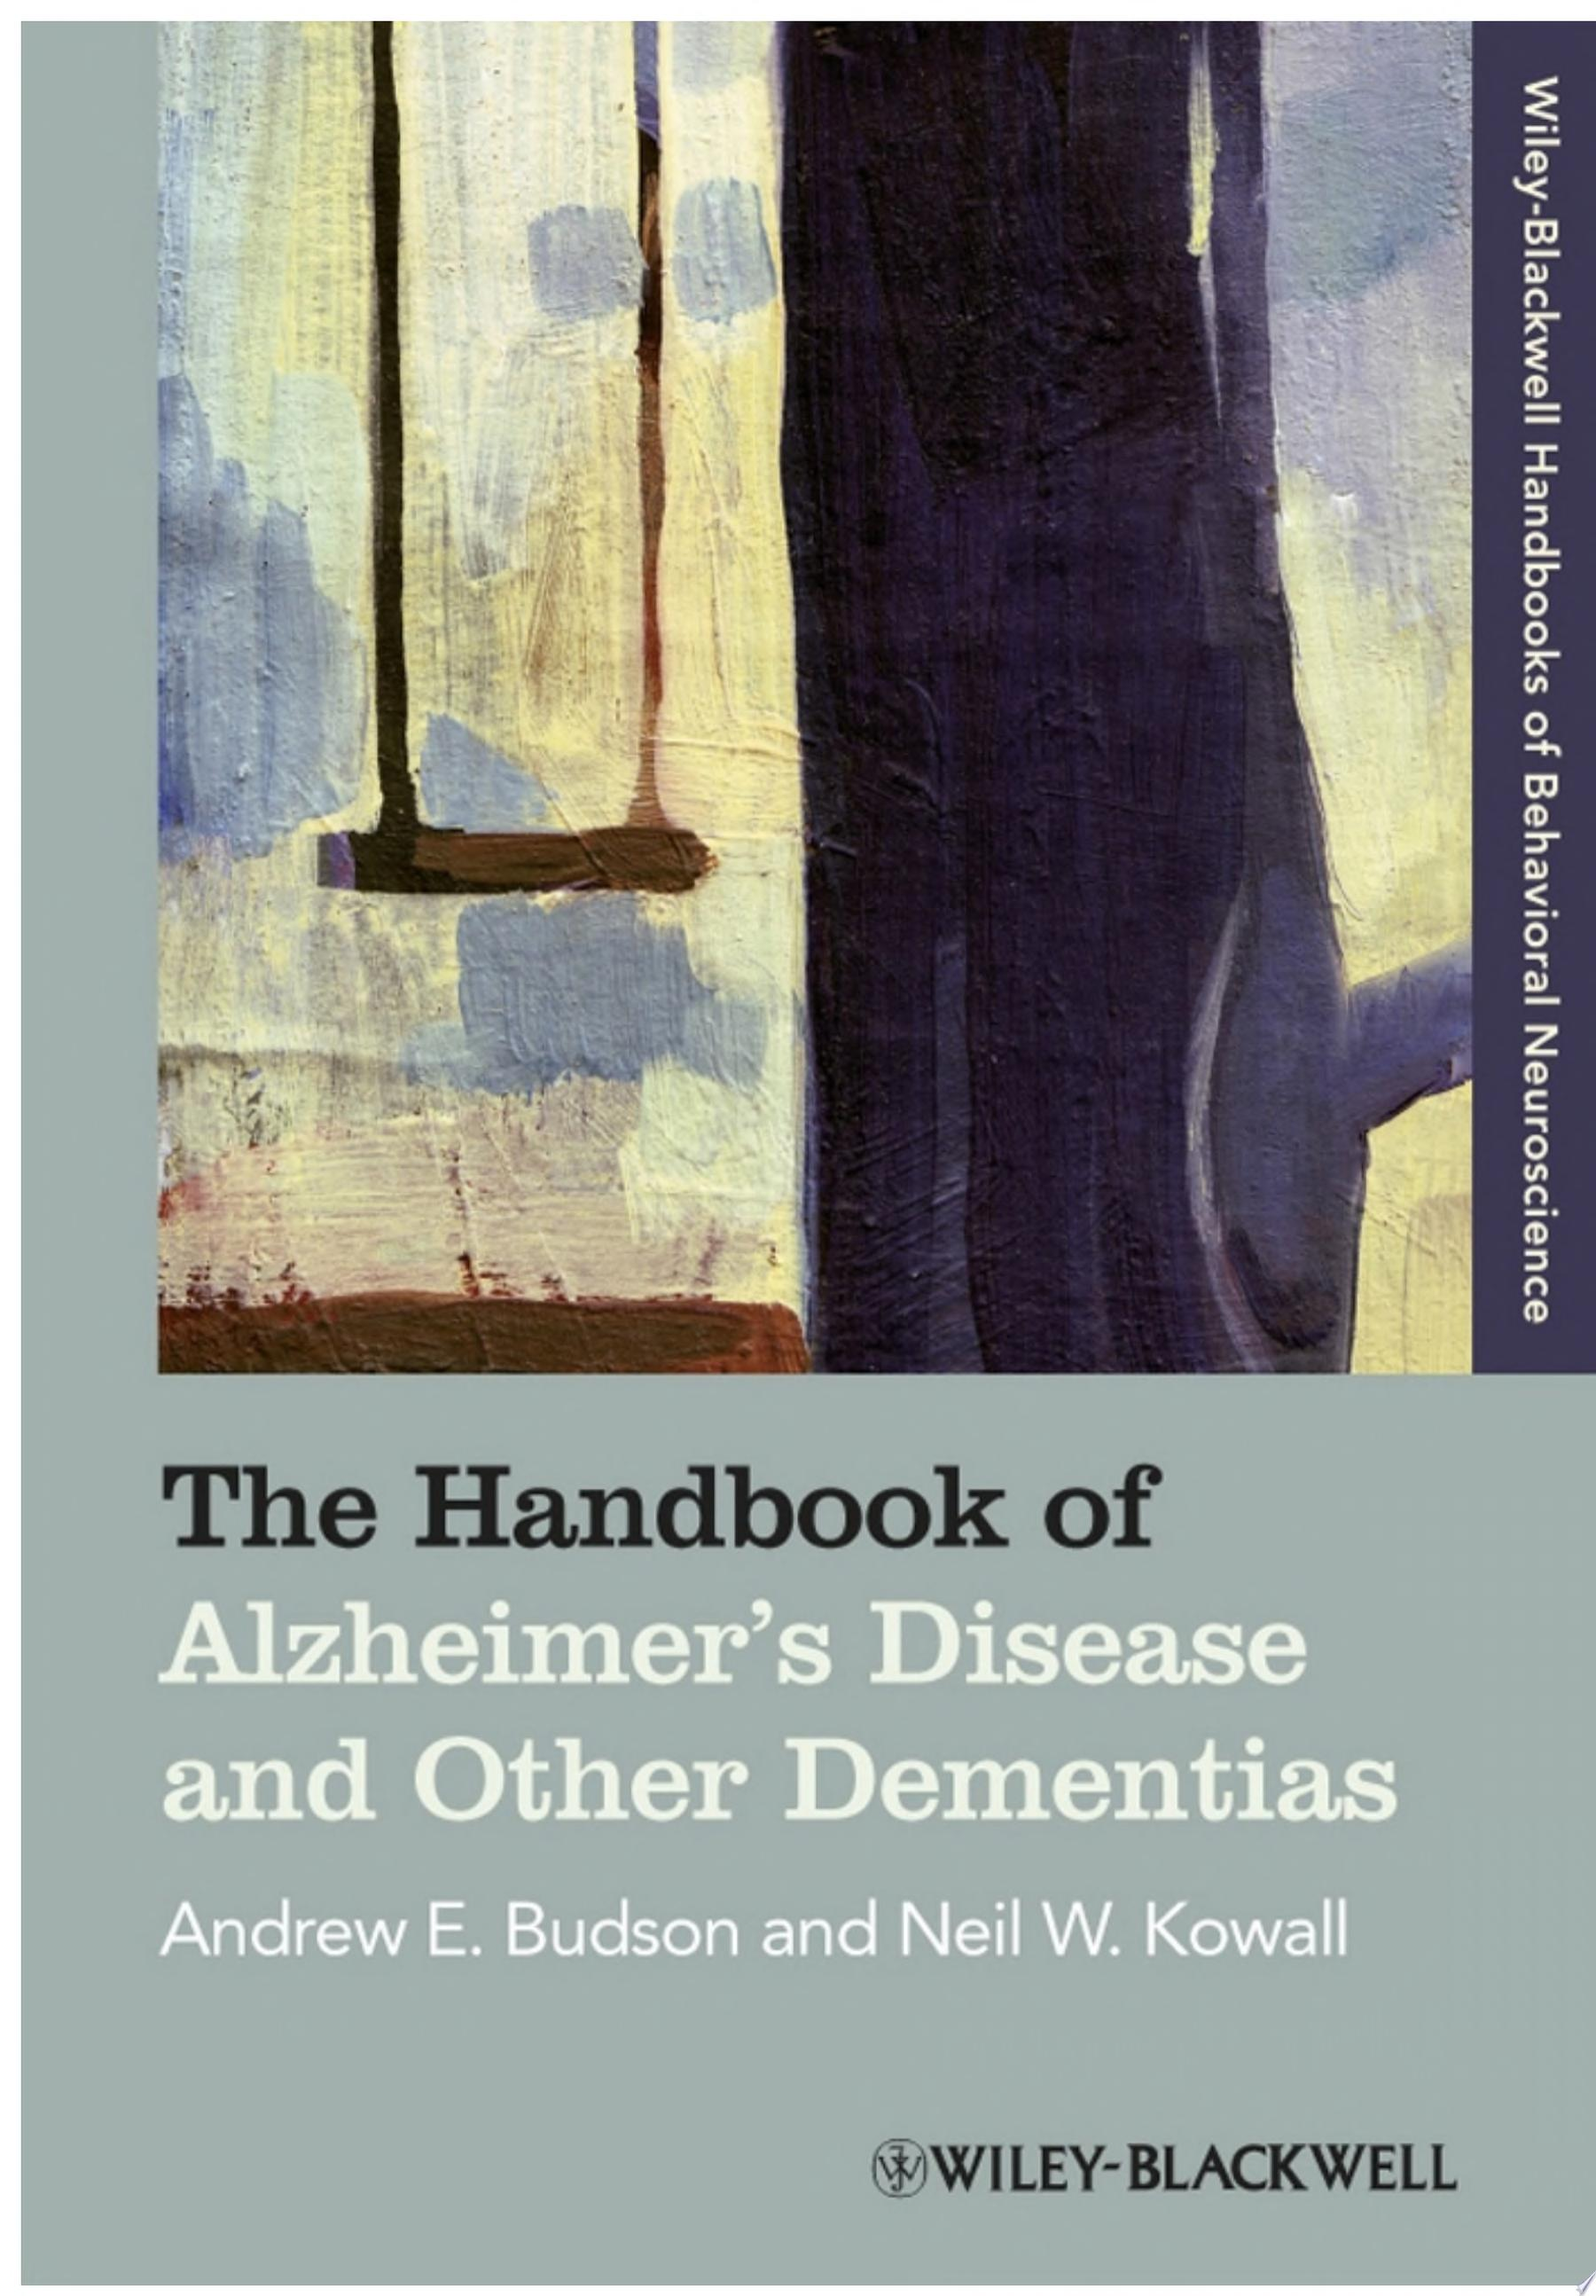 The Handbook of Alzheimer s Disease and Other Dementias